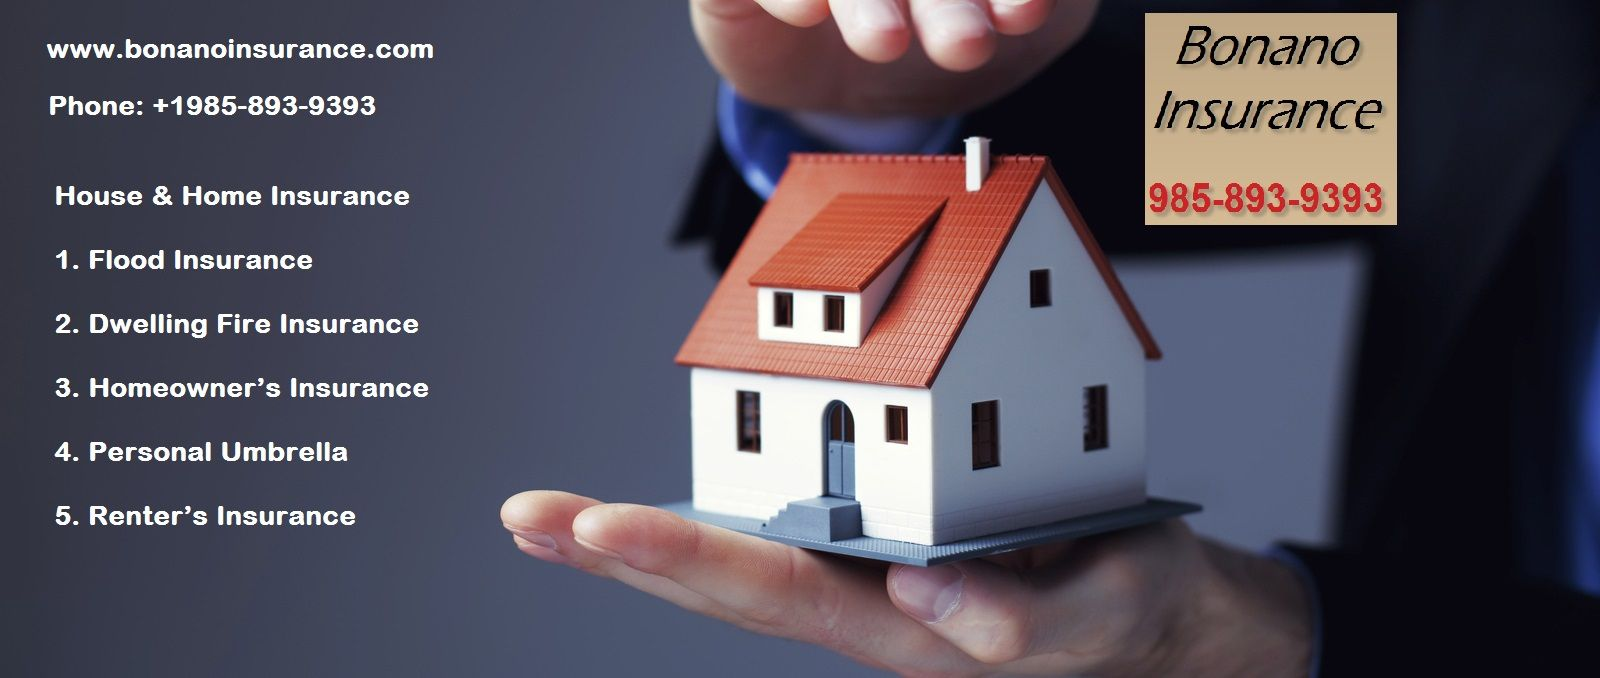 Bonano Insurance Agency is one of the best companies in